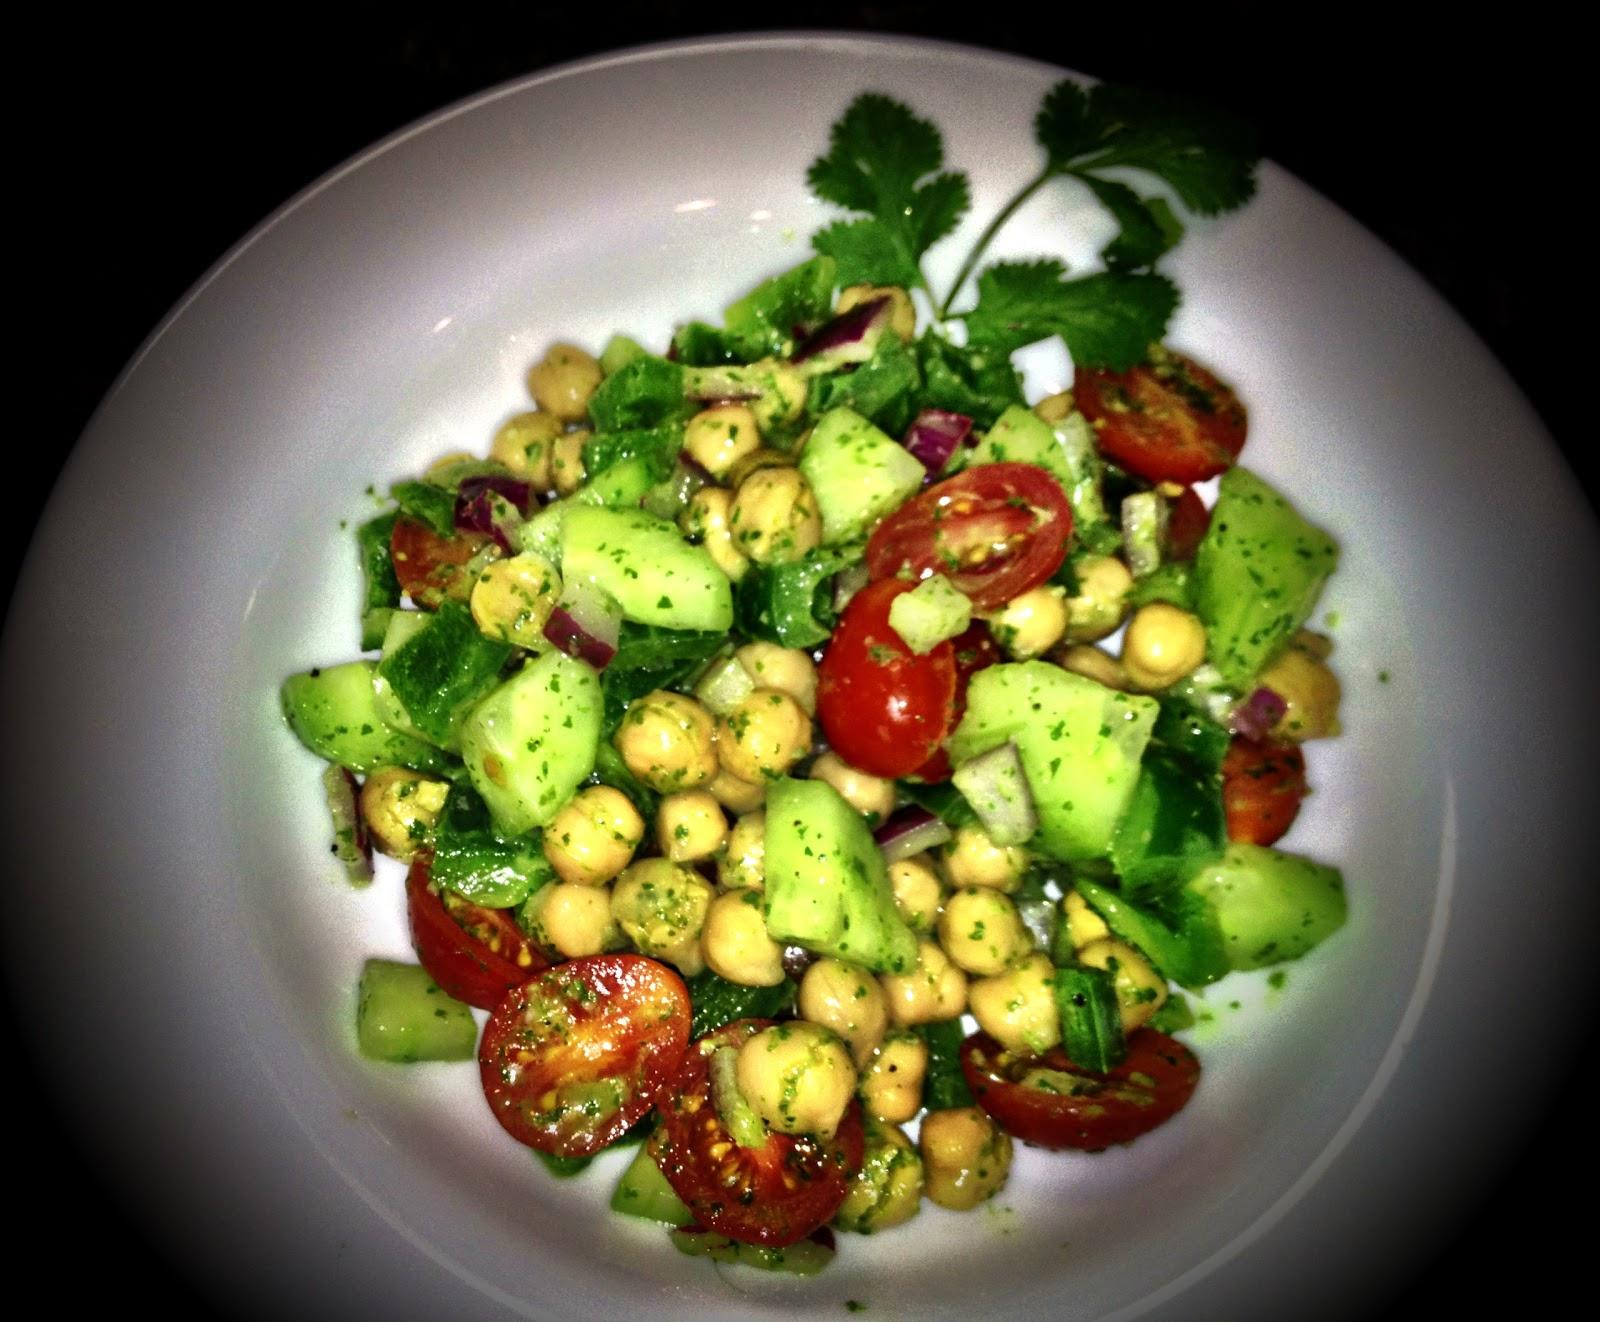 Cilantro lime chickpea salad recipe,vitamins mushrooms health benefits ...